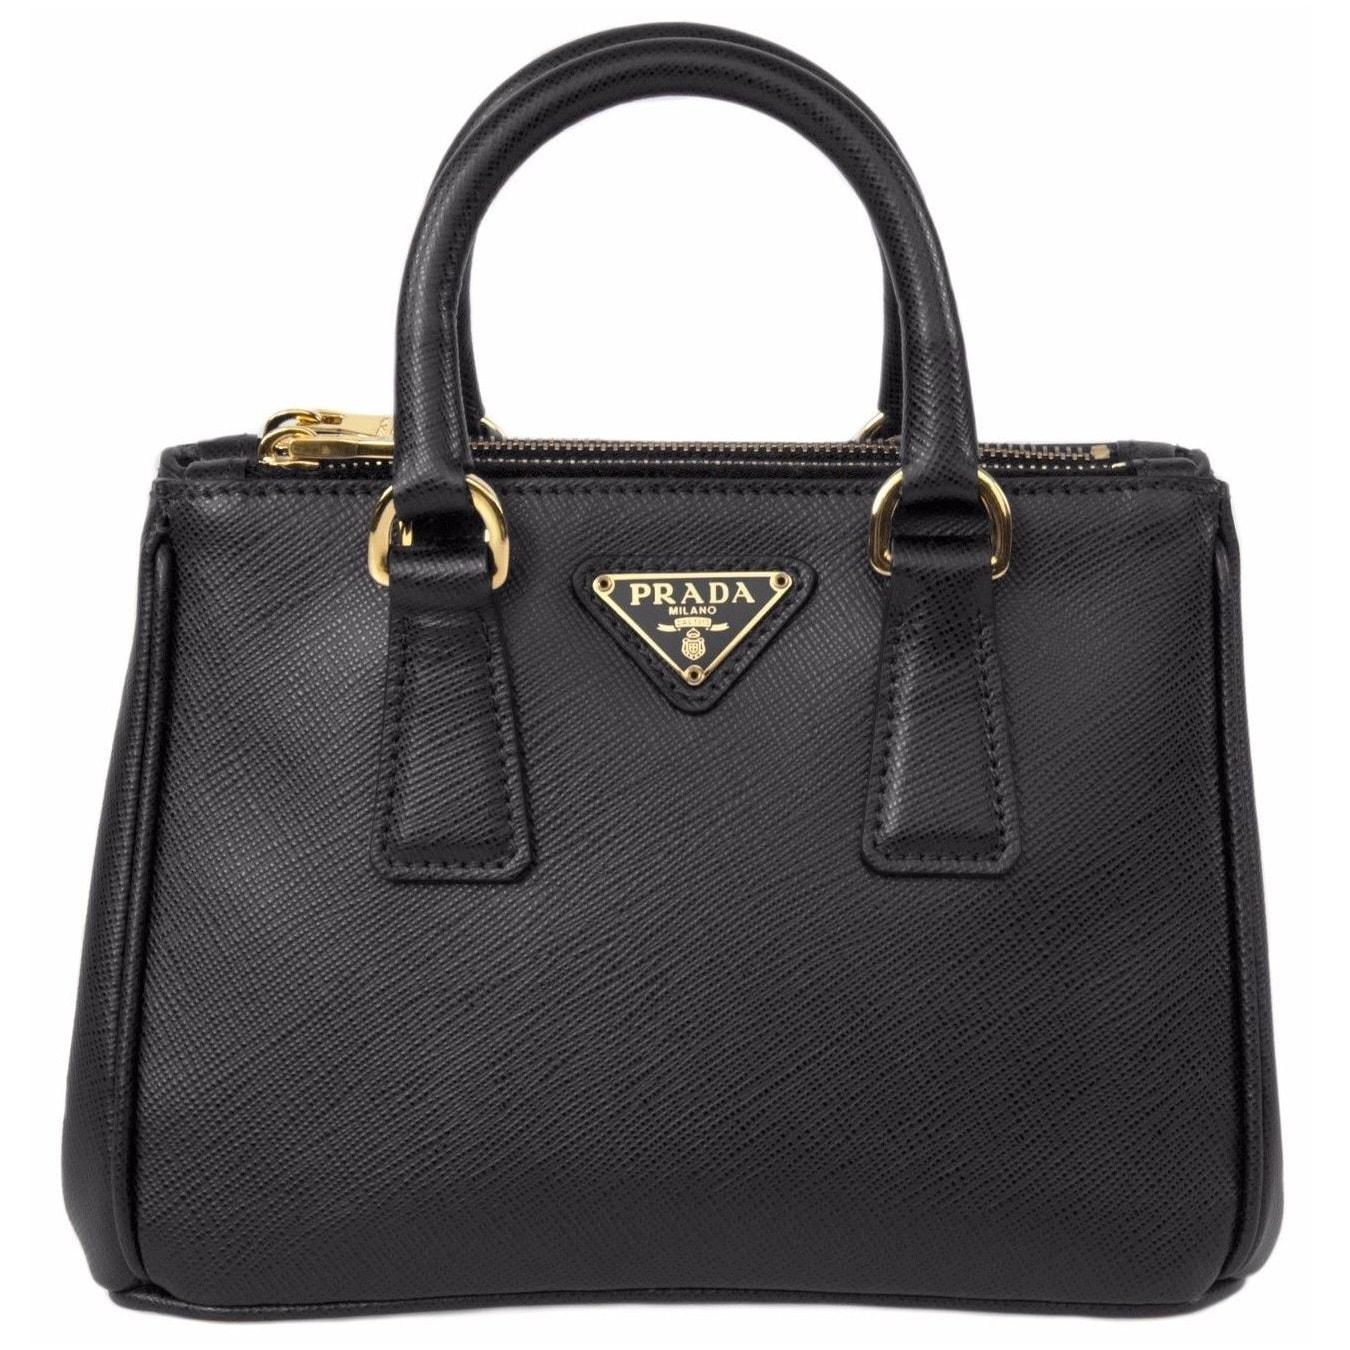 5573ab42e6a1 ... closeout shop prada galleria saffiano leather black mini bag free  shipping today overstock 12089227 83598 1a440